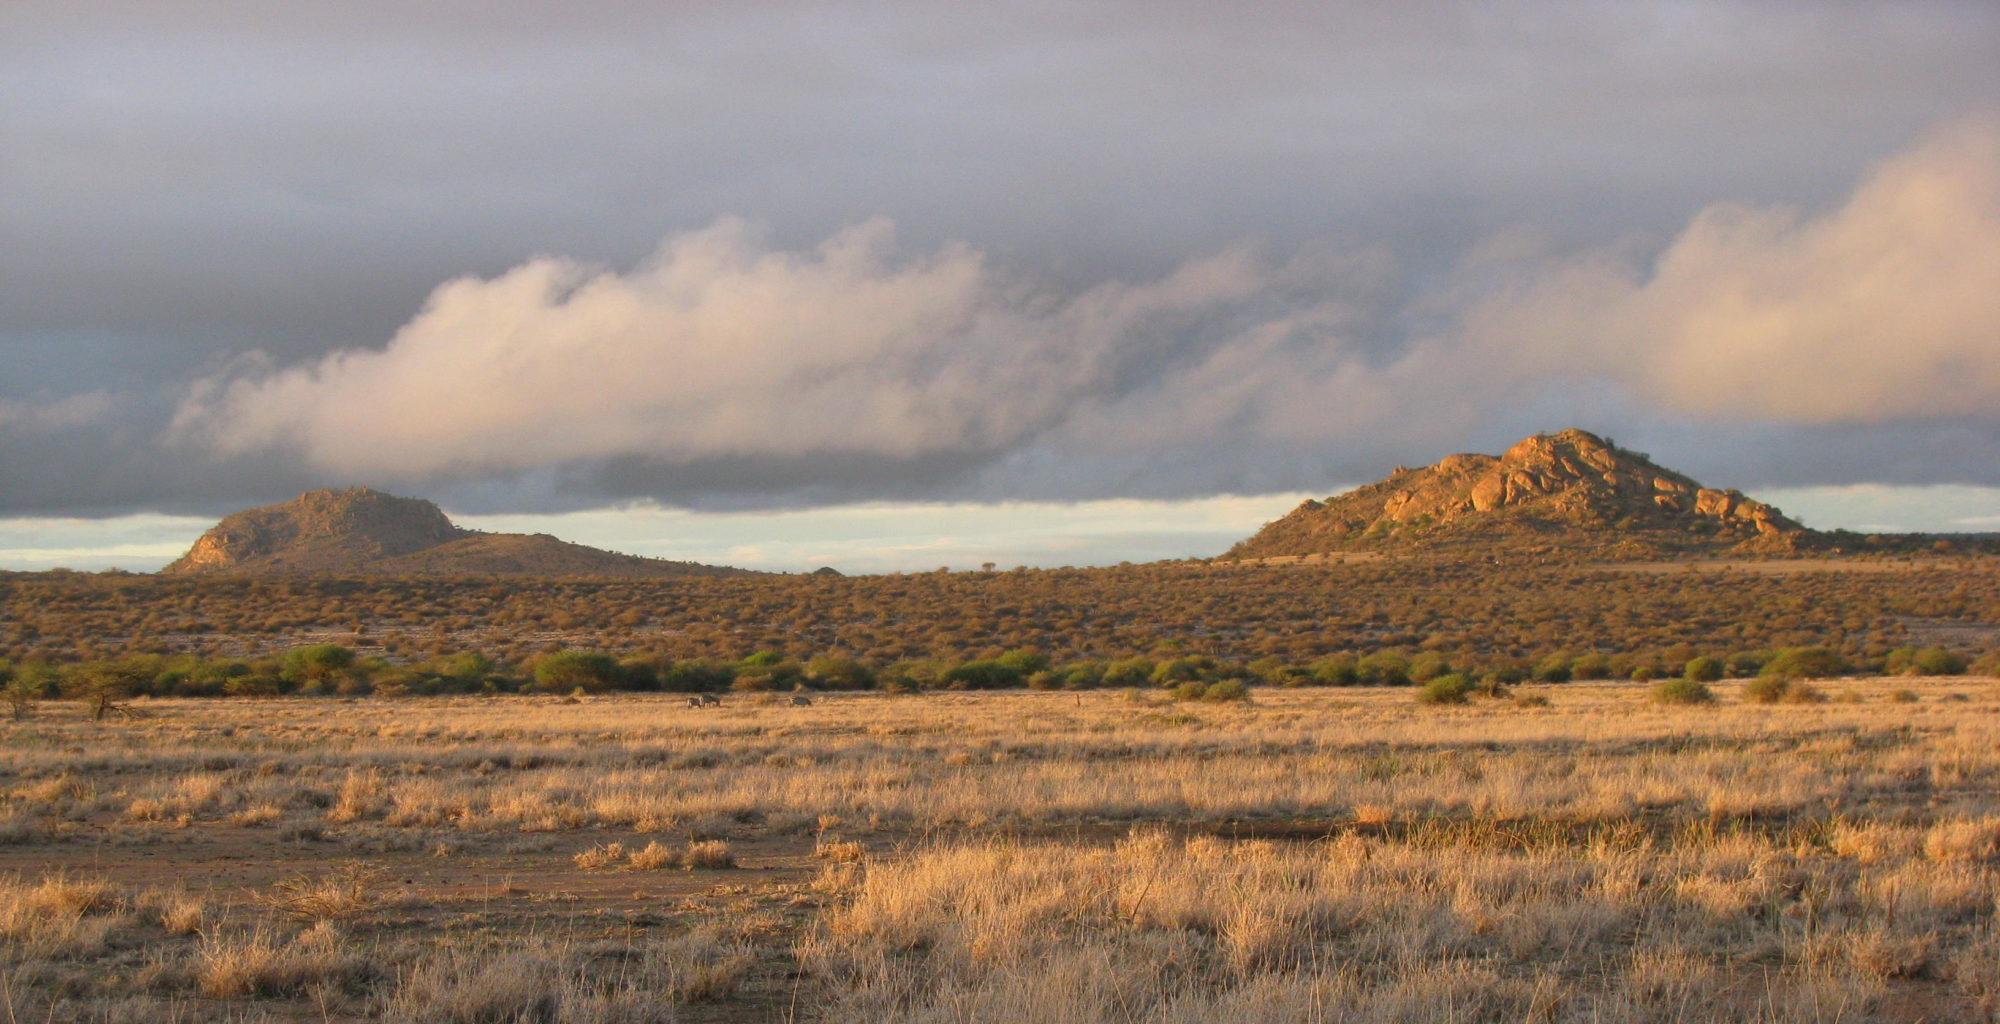 Karisia Safaris Views